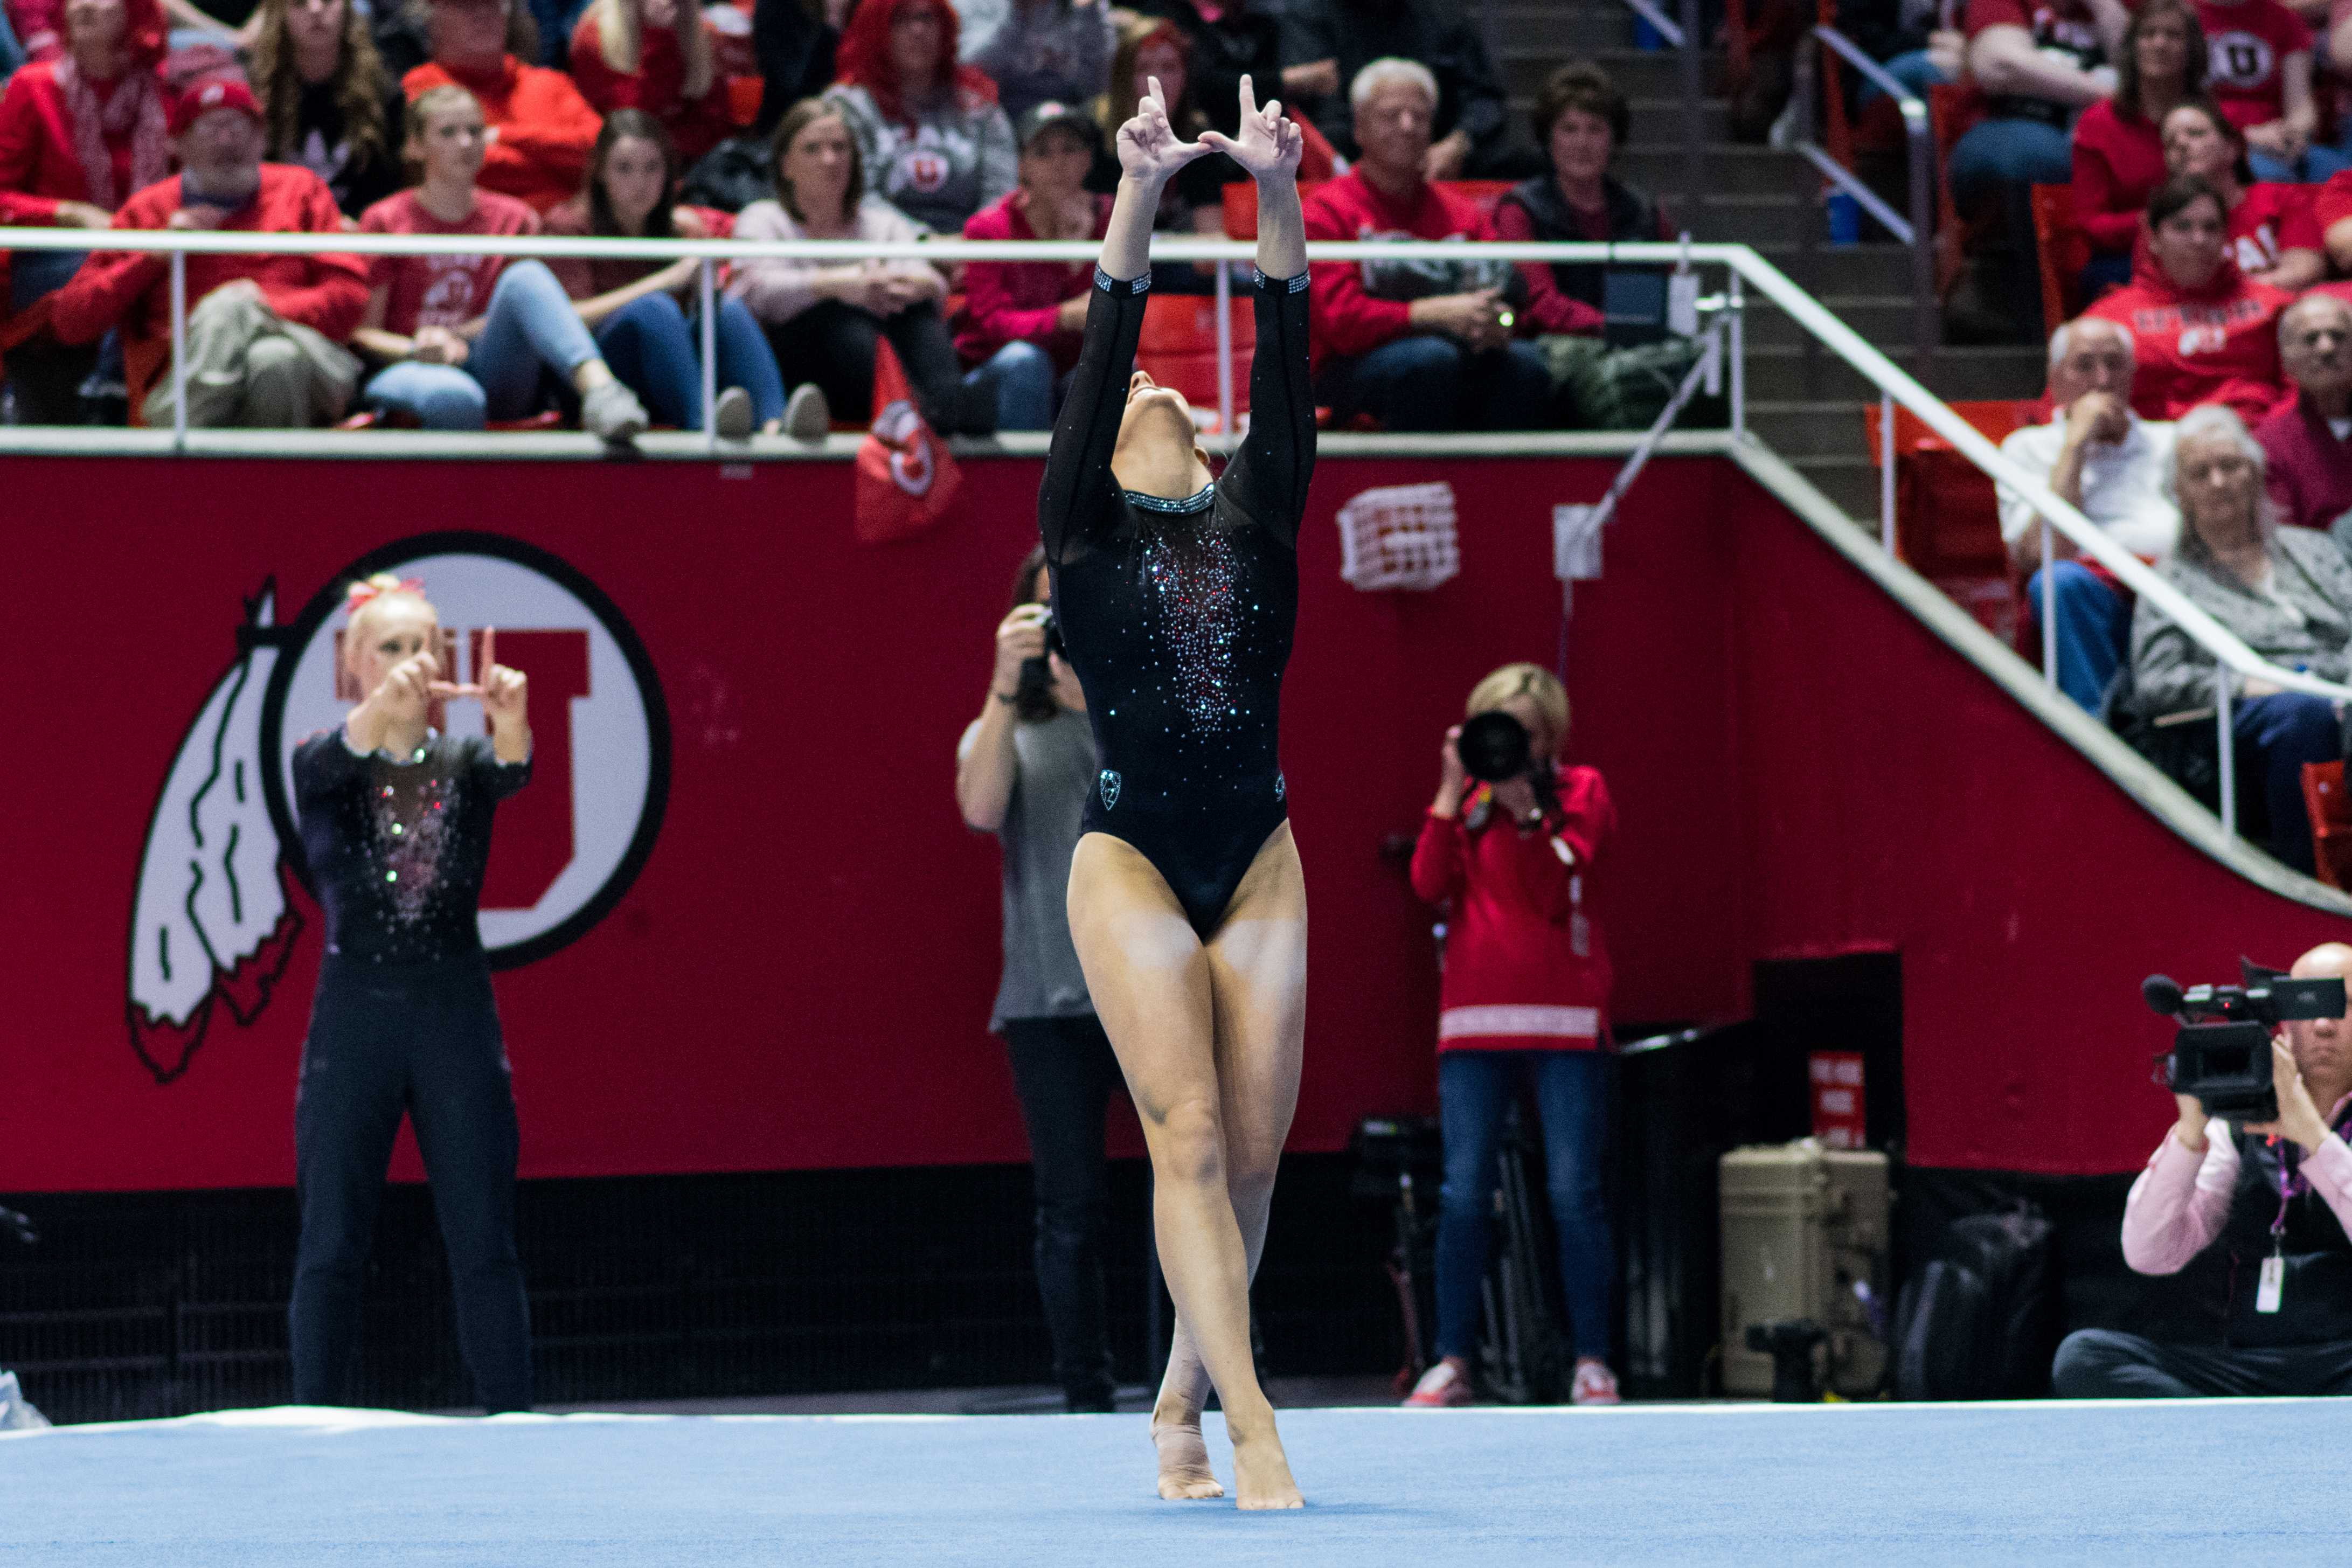 University of Utah junior Mykayla Skinner performed her floor routine in an NCAA Women's Gymnastics meet vs. UCLA at Jon M. Huntsman Center in Salt Lake City, UT on Saturday February 23, 2019.  (Photo by Curtis Lin | The Daily Utah Chronicle)